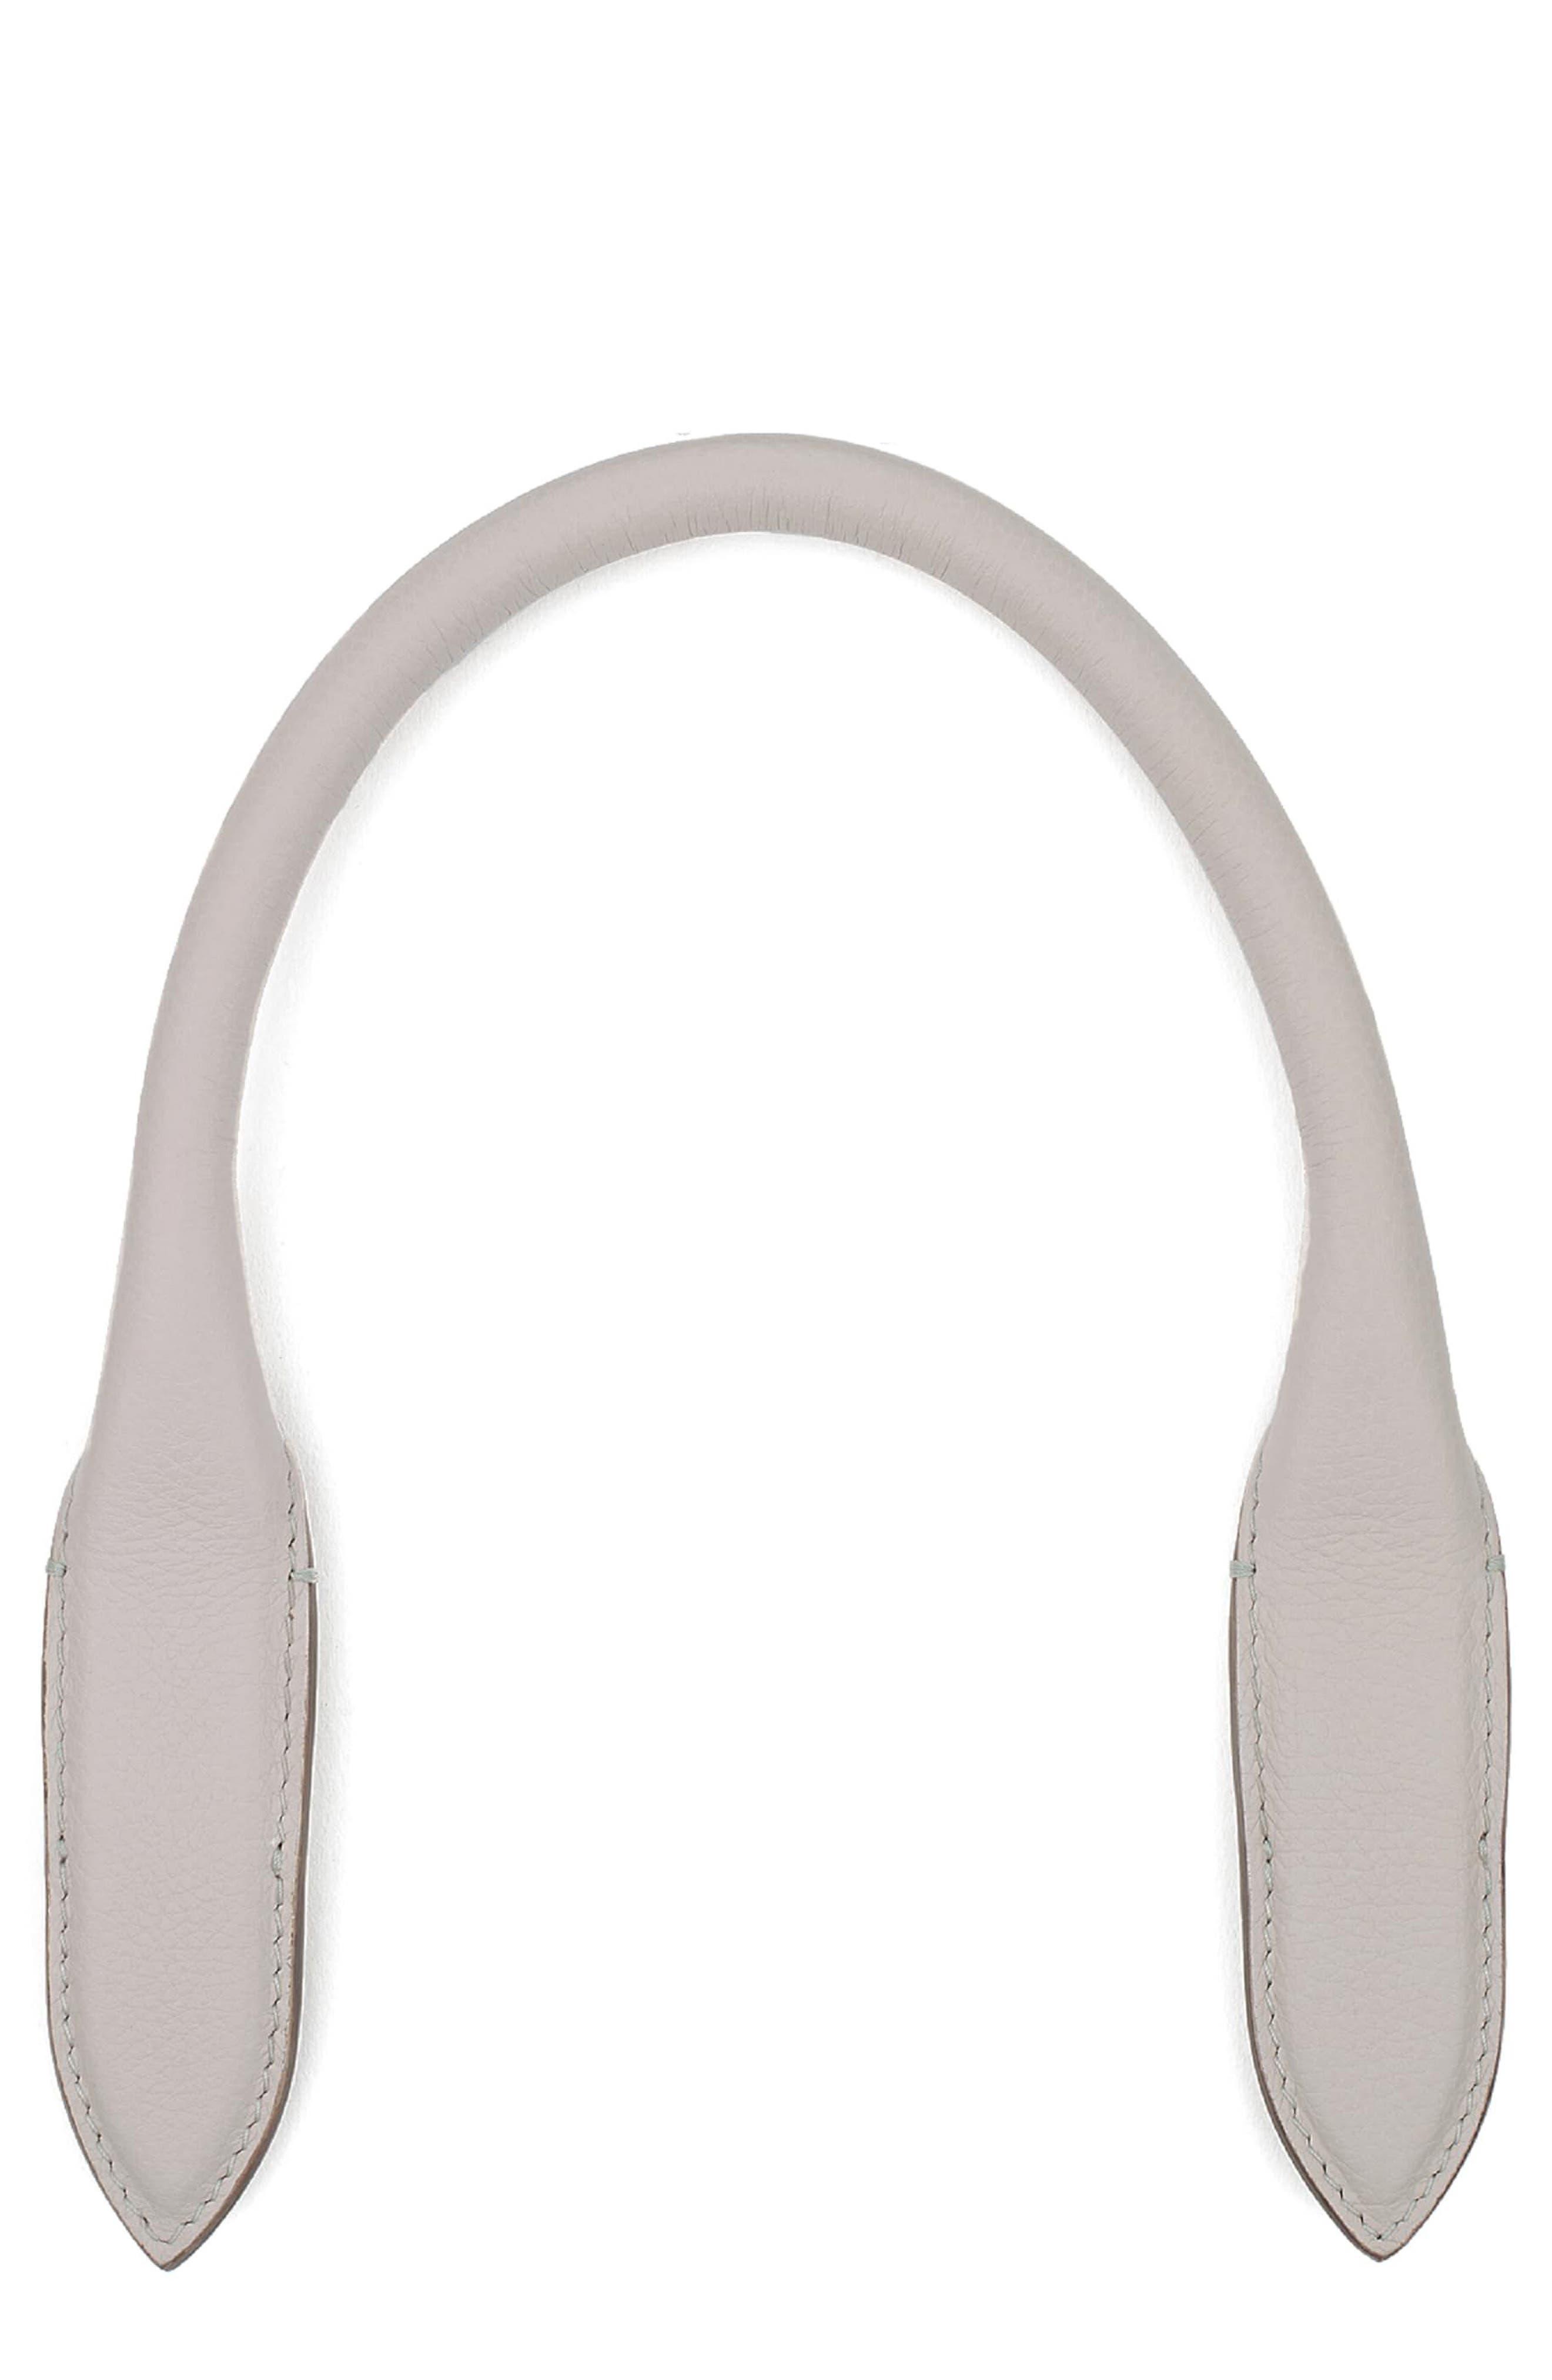 Anya Hindmarch Build a Bag Tubular Leather Handle